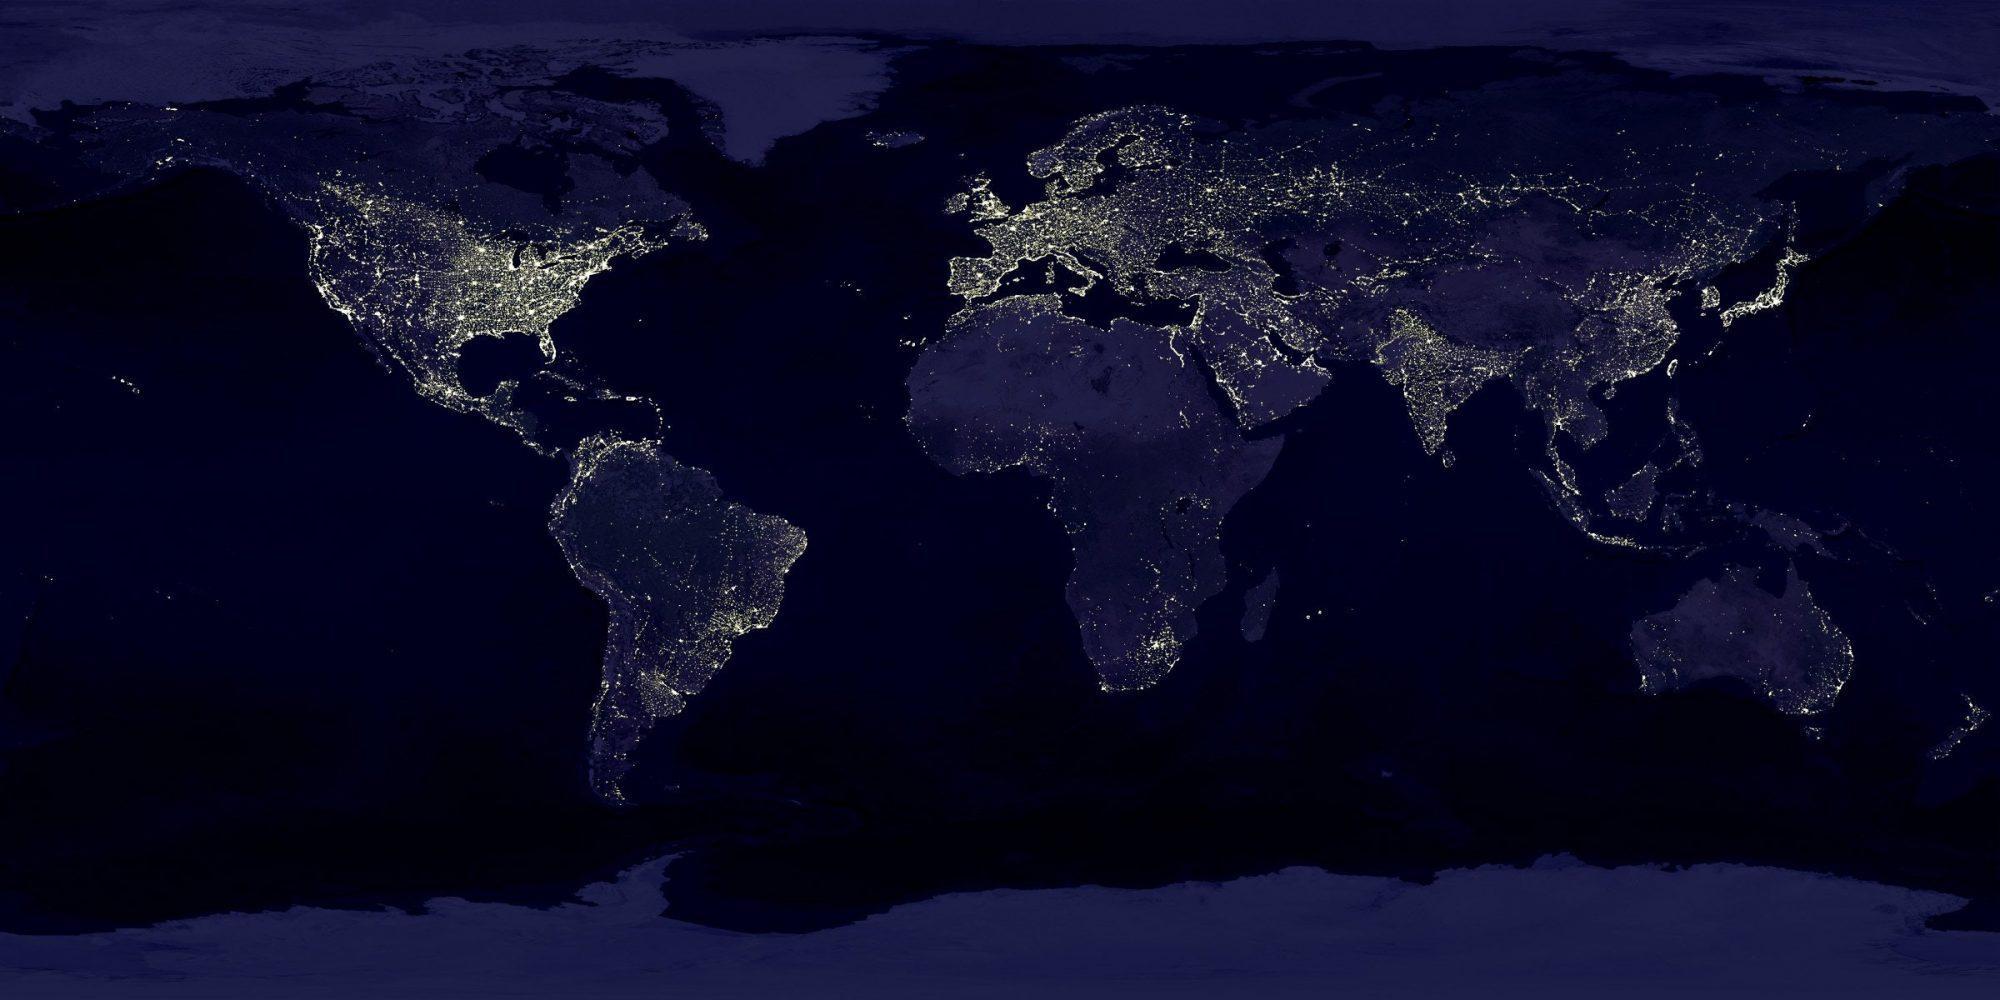 világ, kontinensek